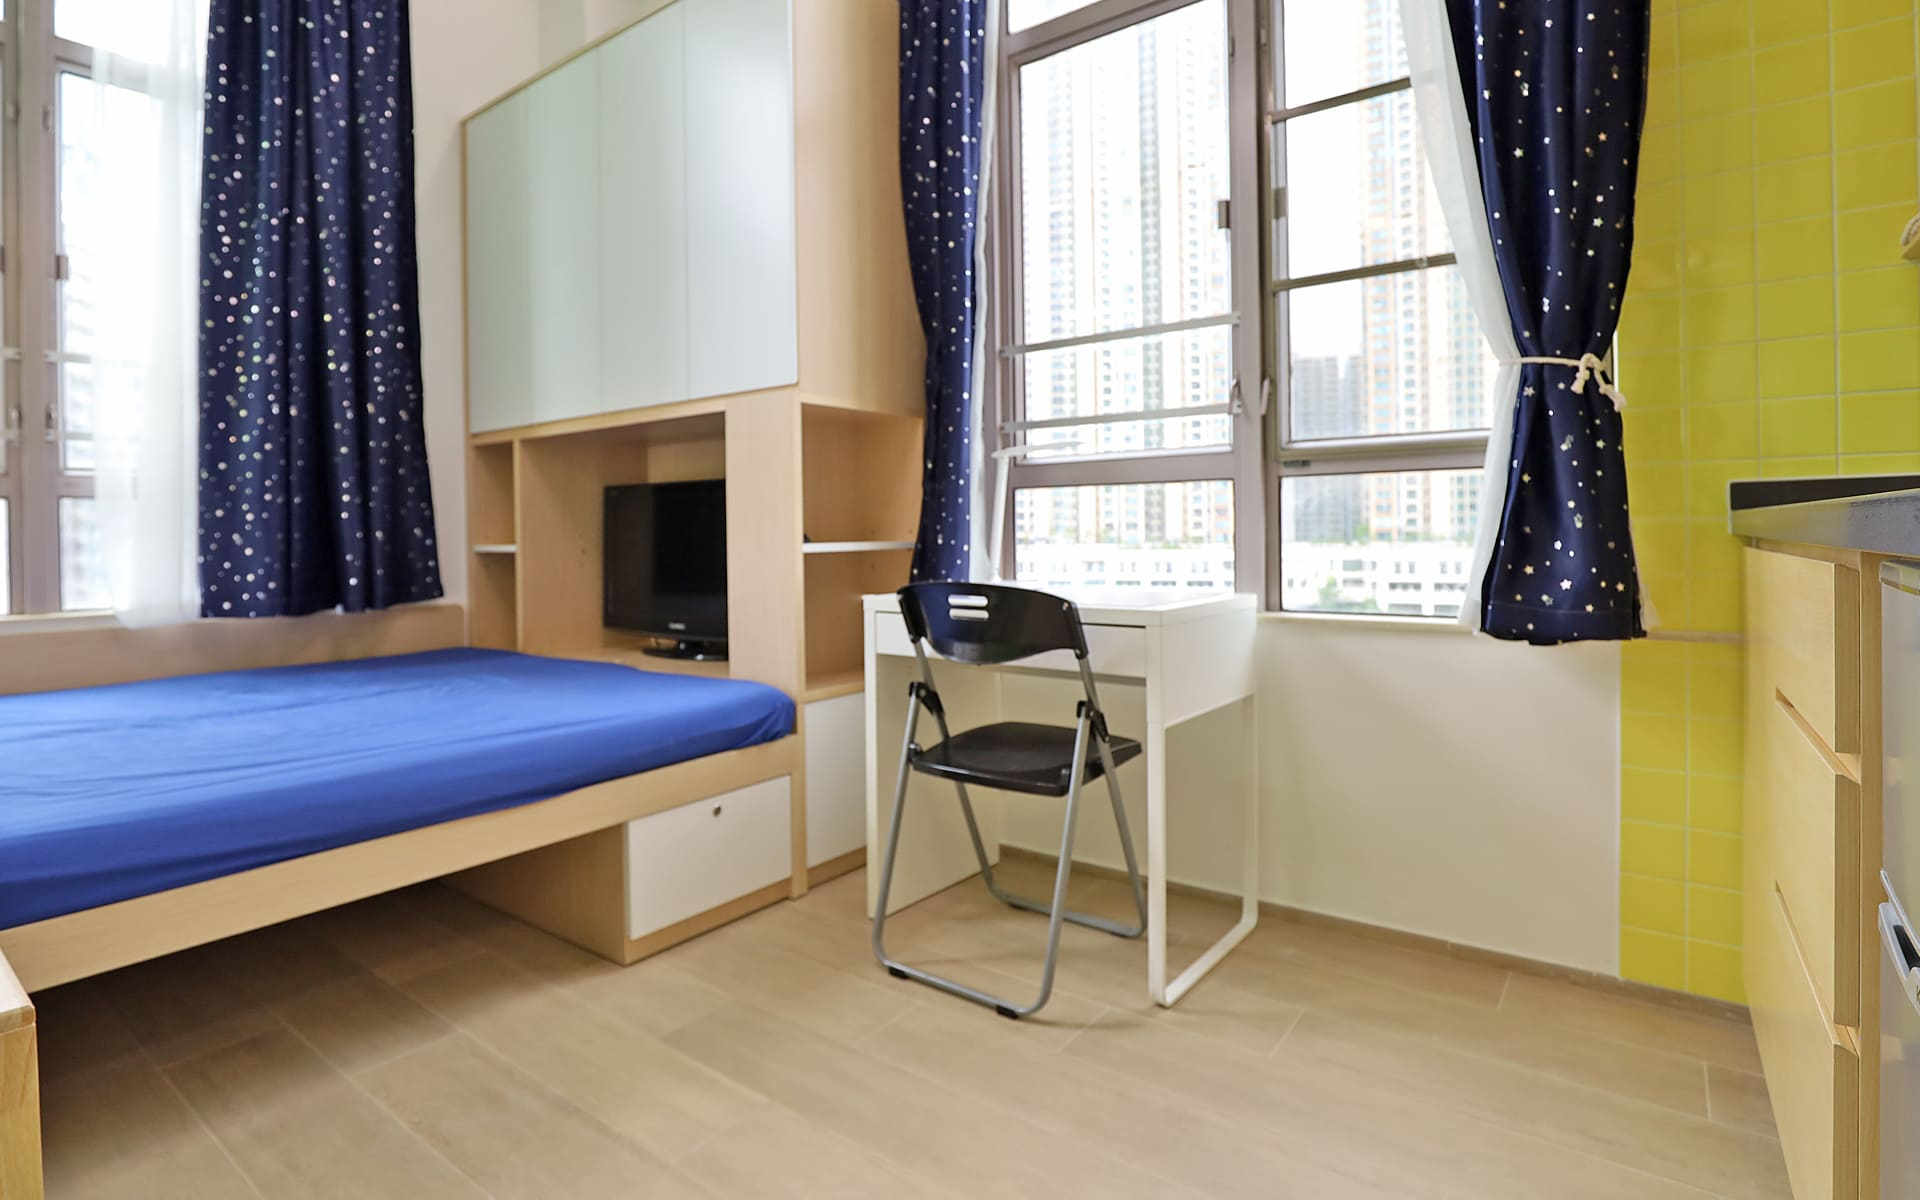 hk_service_apartment_8513533461596691912.jpg